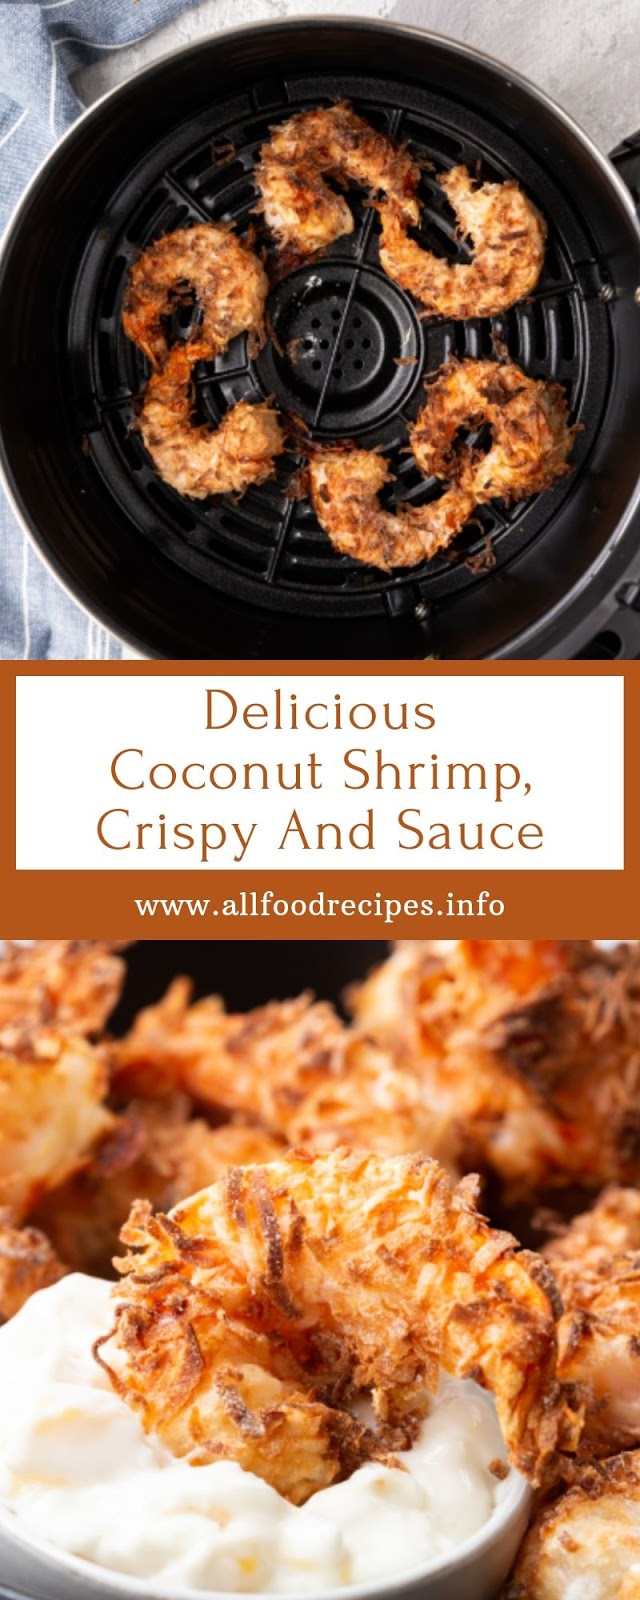 Delicious Coconut Shrimp, Crispy And Sauce